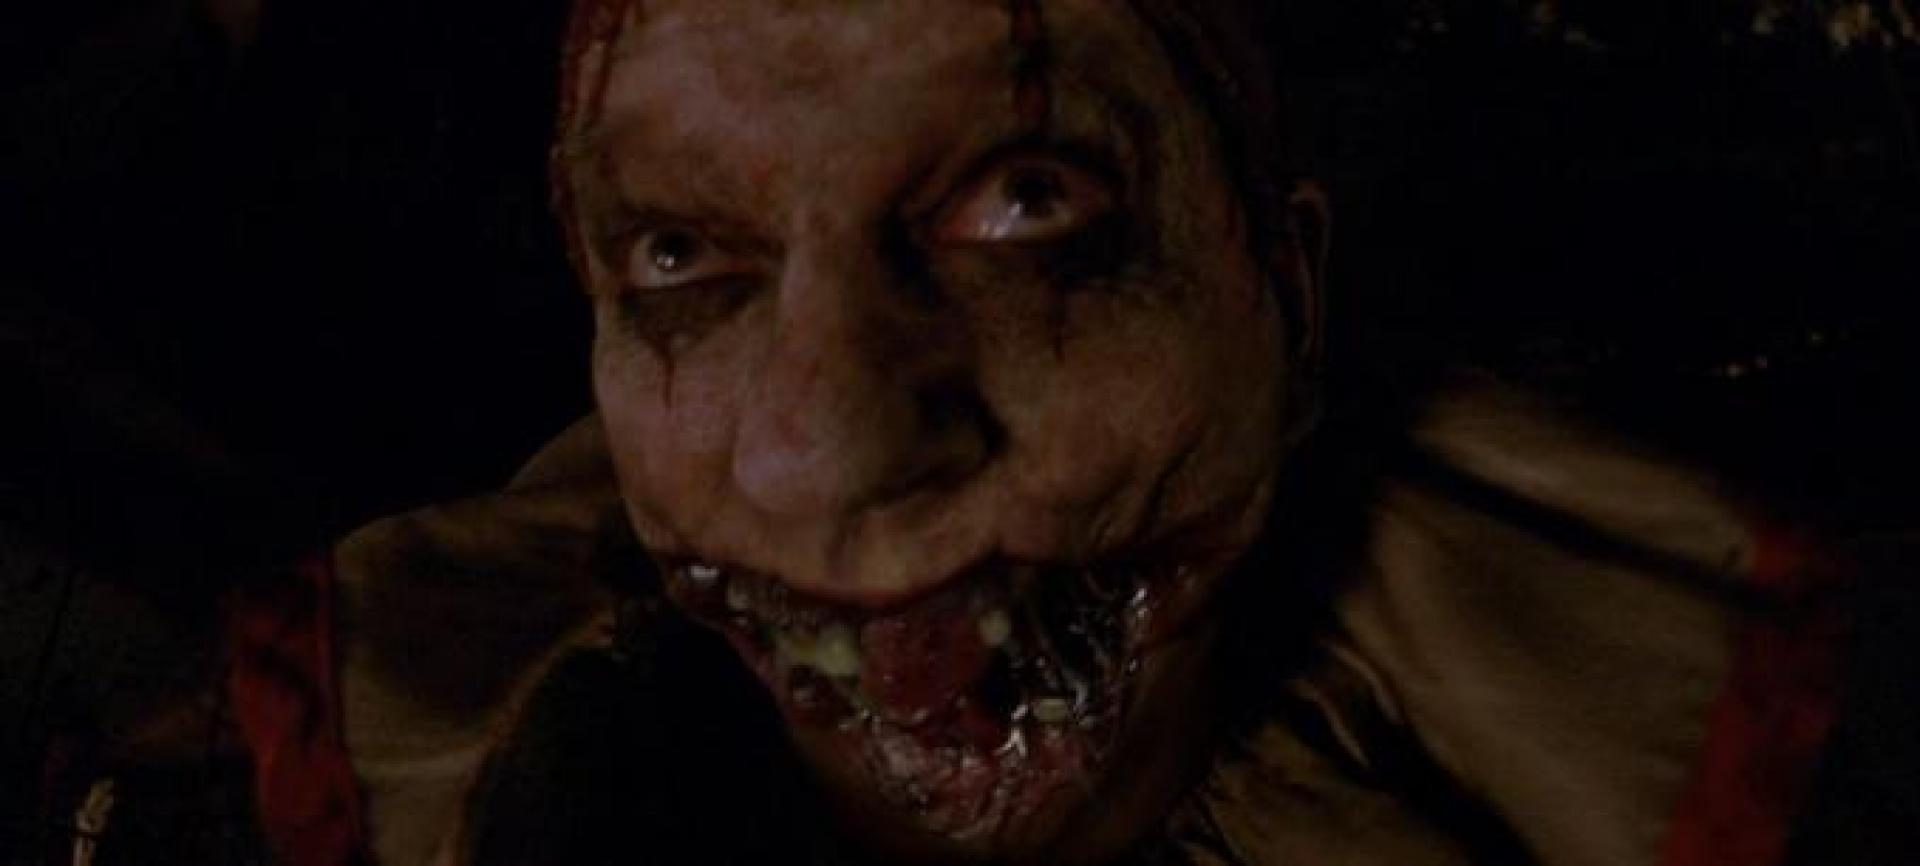 American Horror Story: Freak Show - 4x02